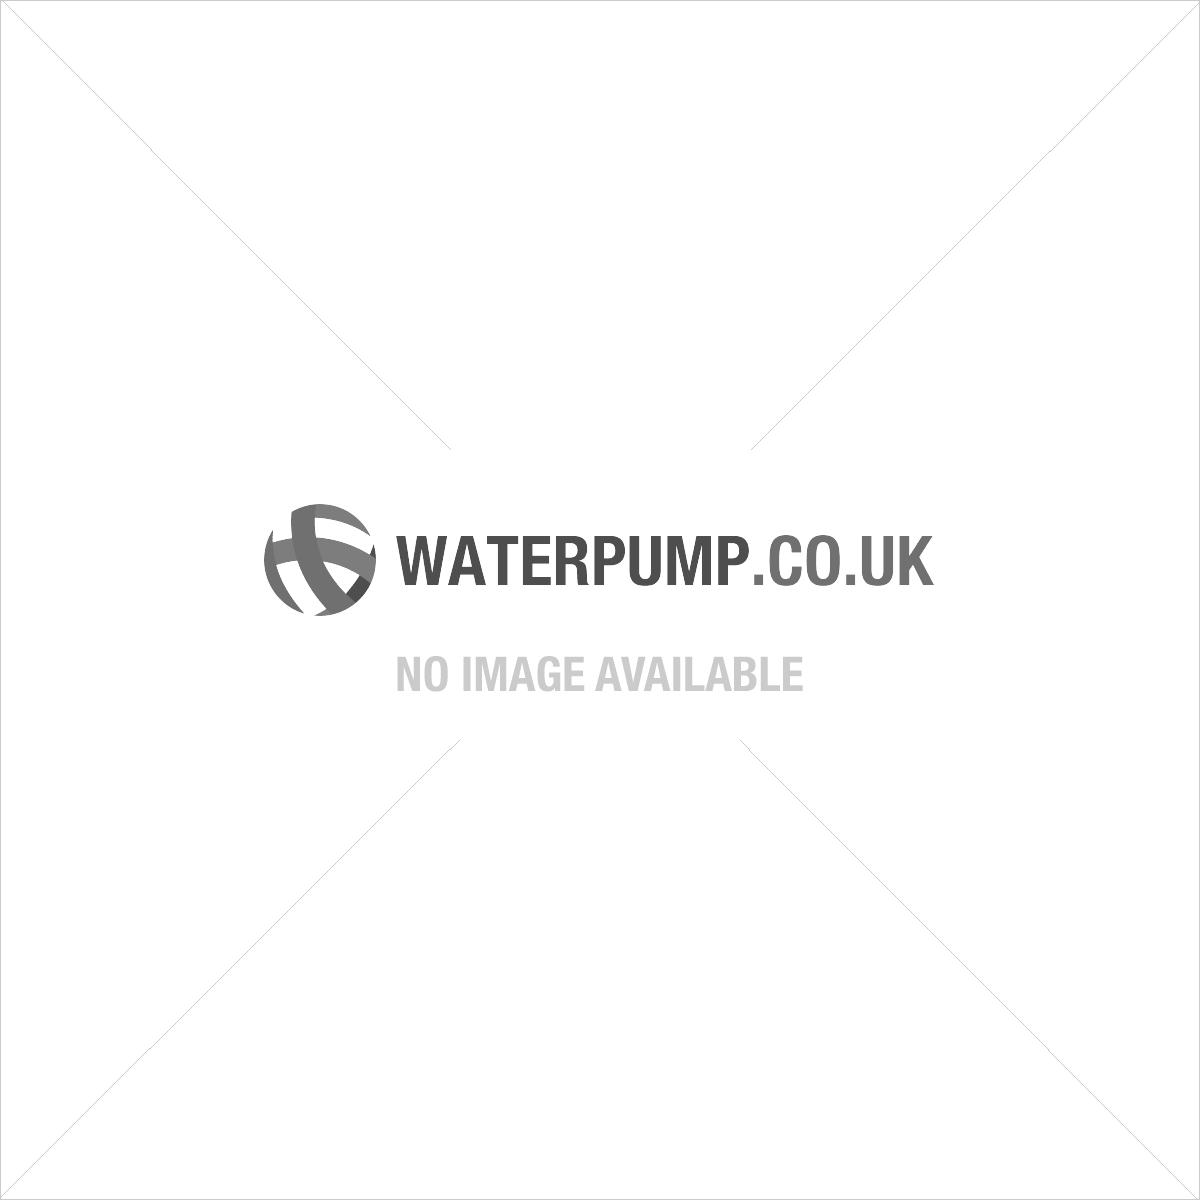 DAB VERTY NOVA 200 M-A Submersible Puddle Pump